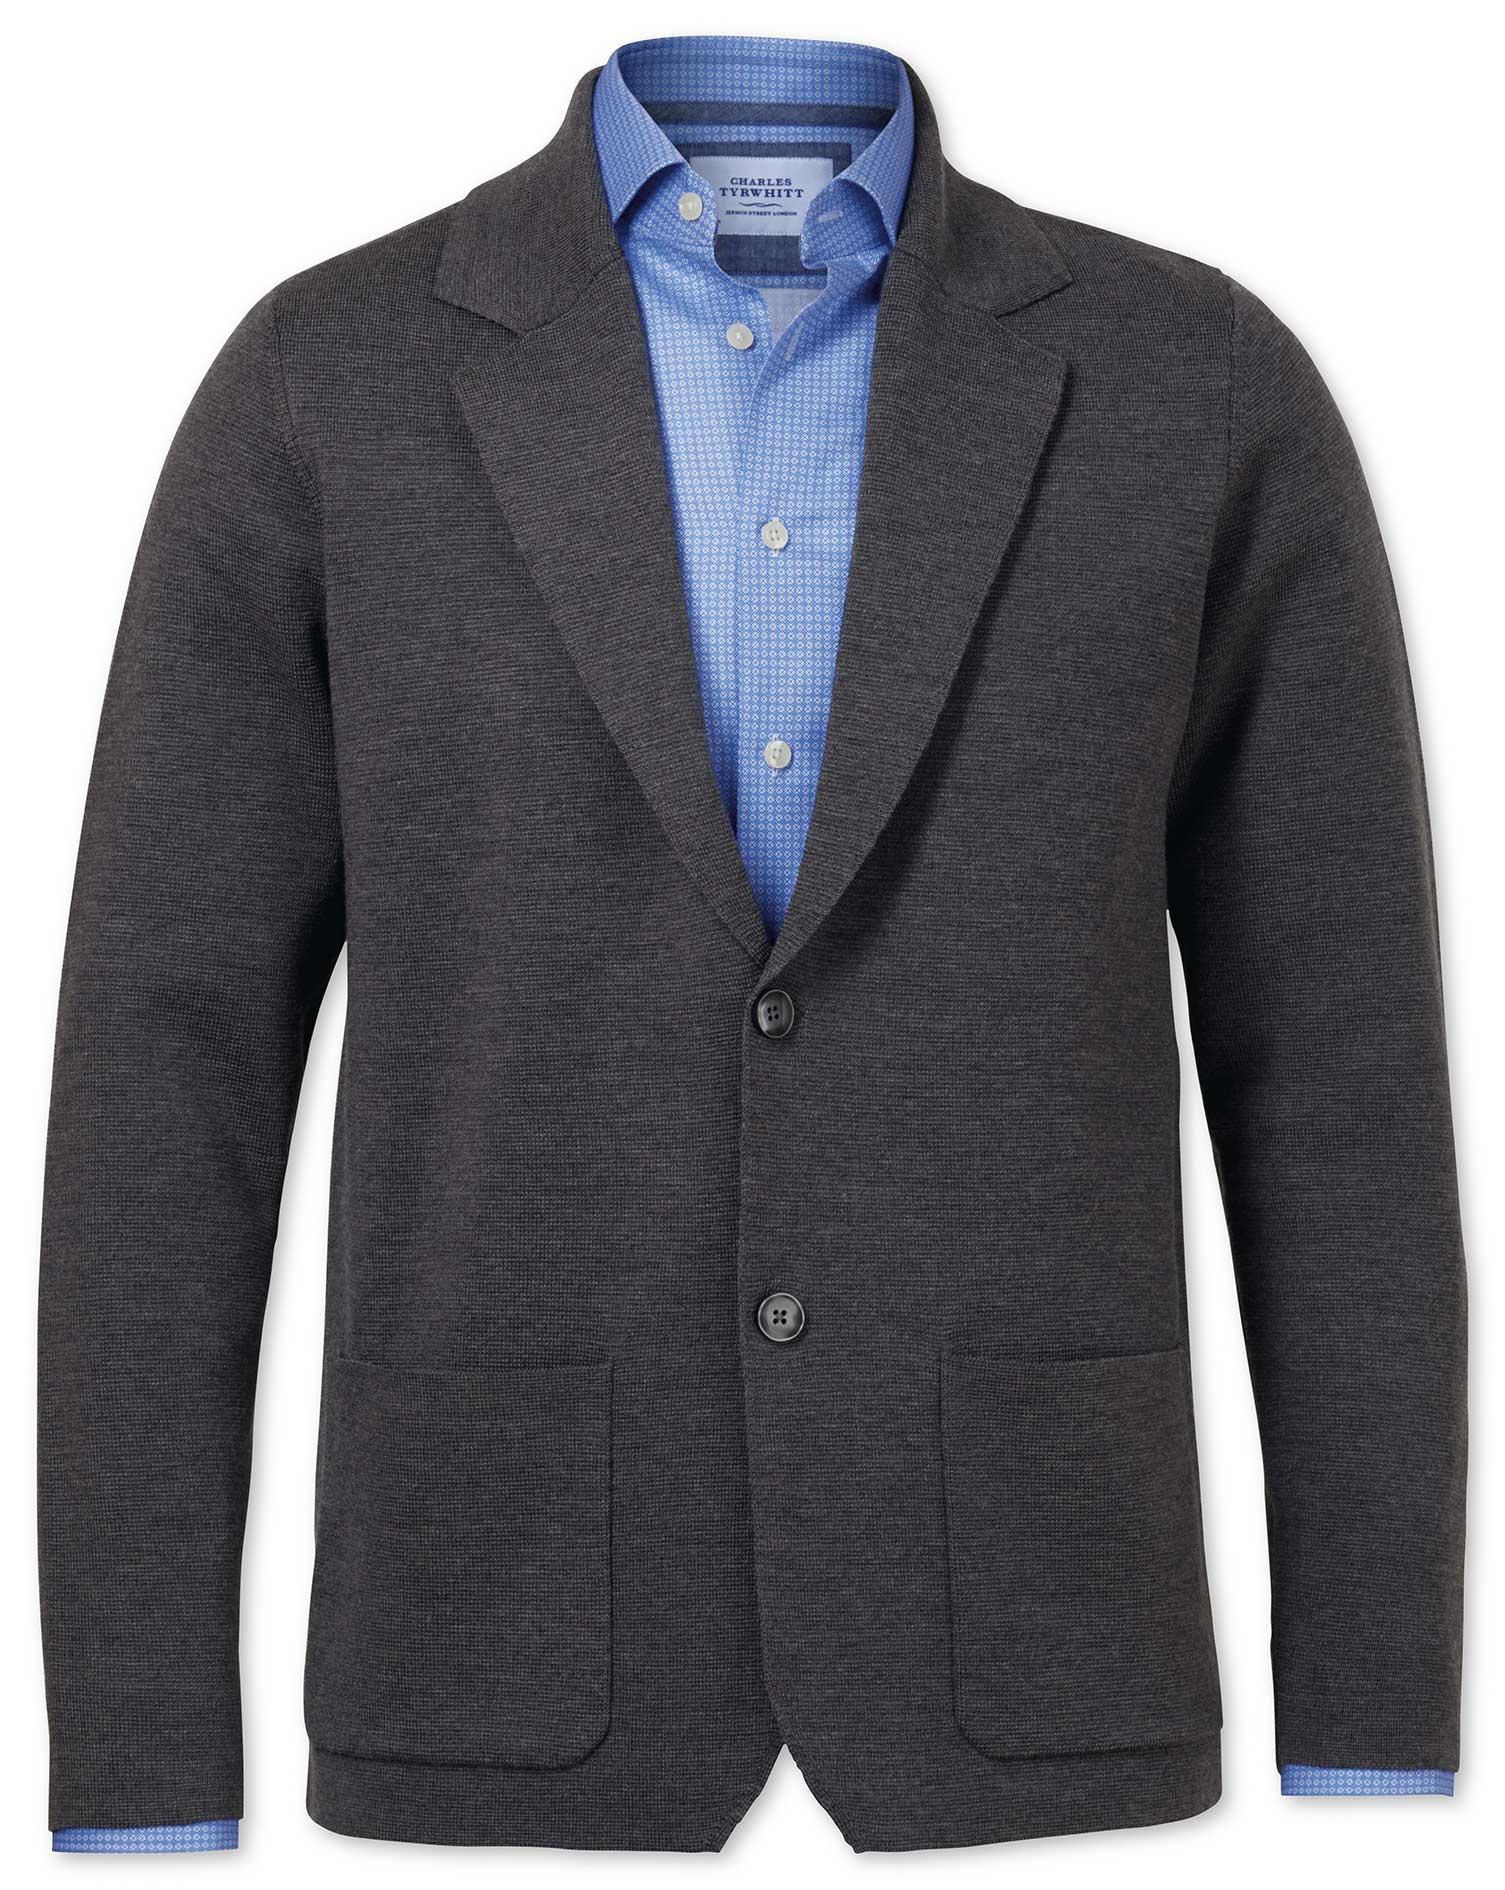 Charcoal Merino Wool Blazer Size XL by Charles Tyrwhitt